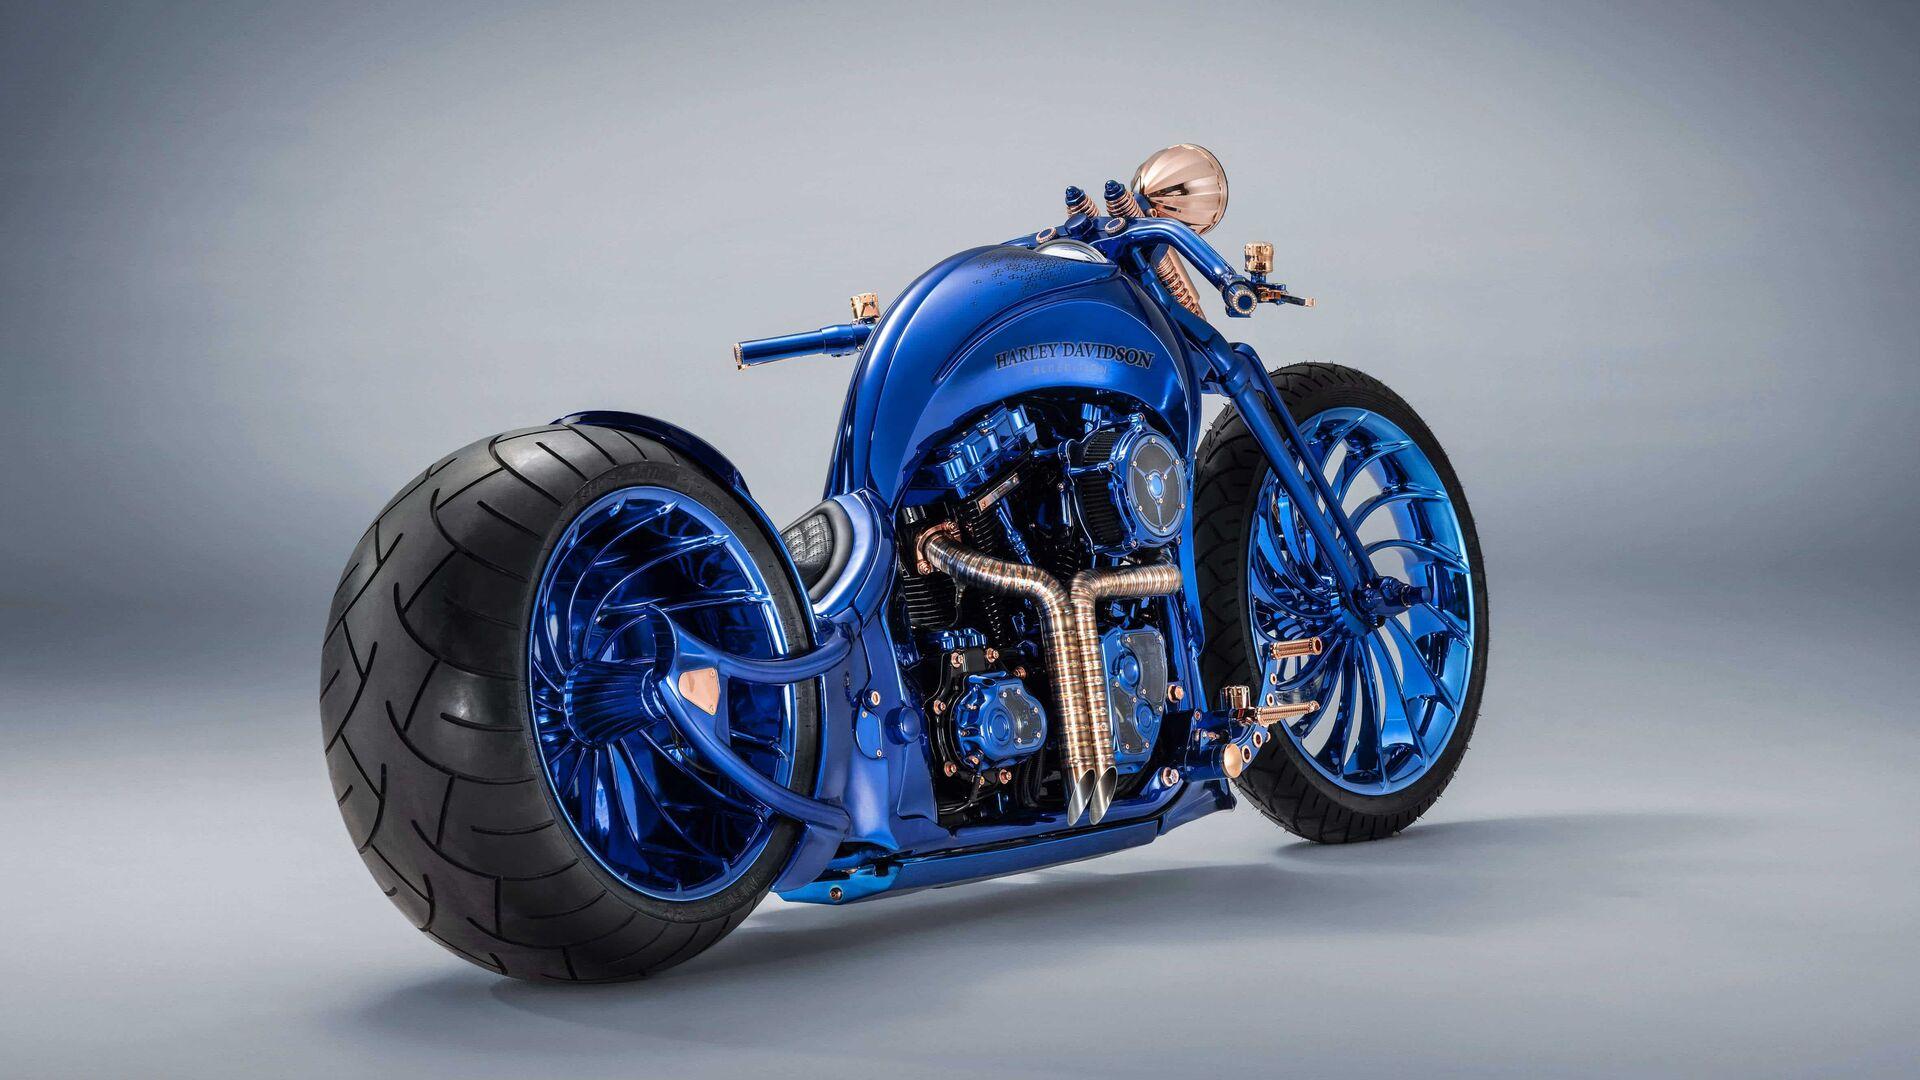 1920x1080 Harley Davidson Blue Edition Laptop Full Hd 1080p